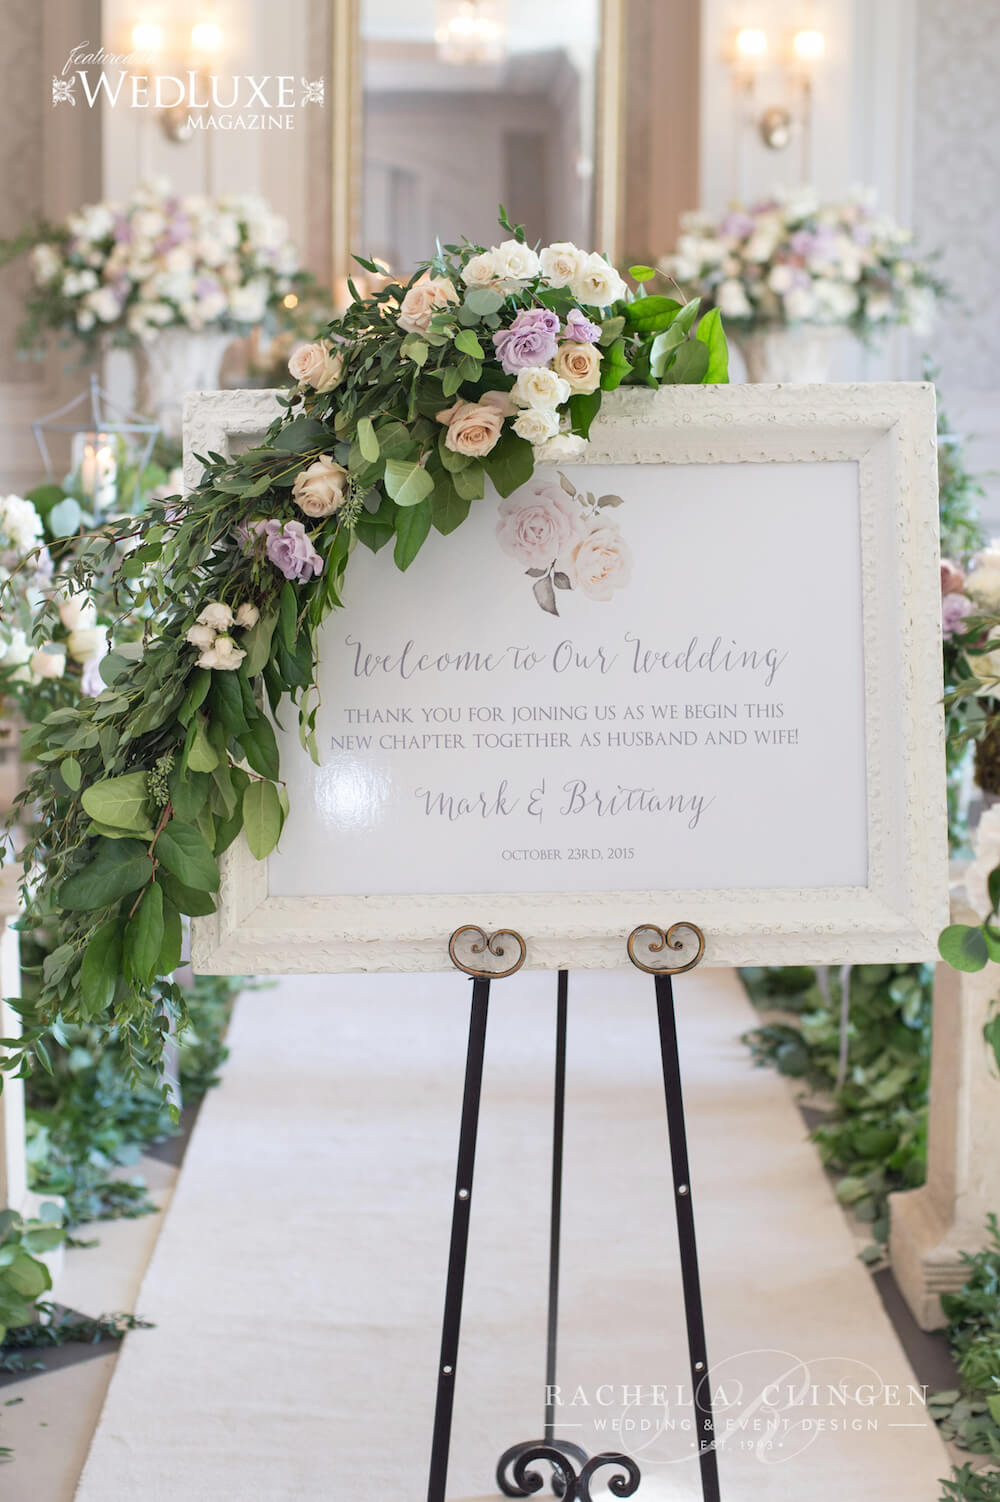 a chair affair gym shop hazelton manor weddings archives - wedding decor toronto rachel a. clingen & event design